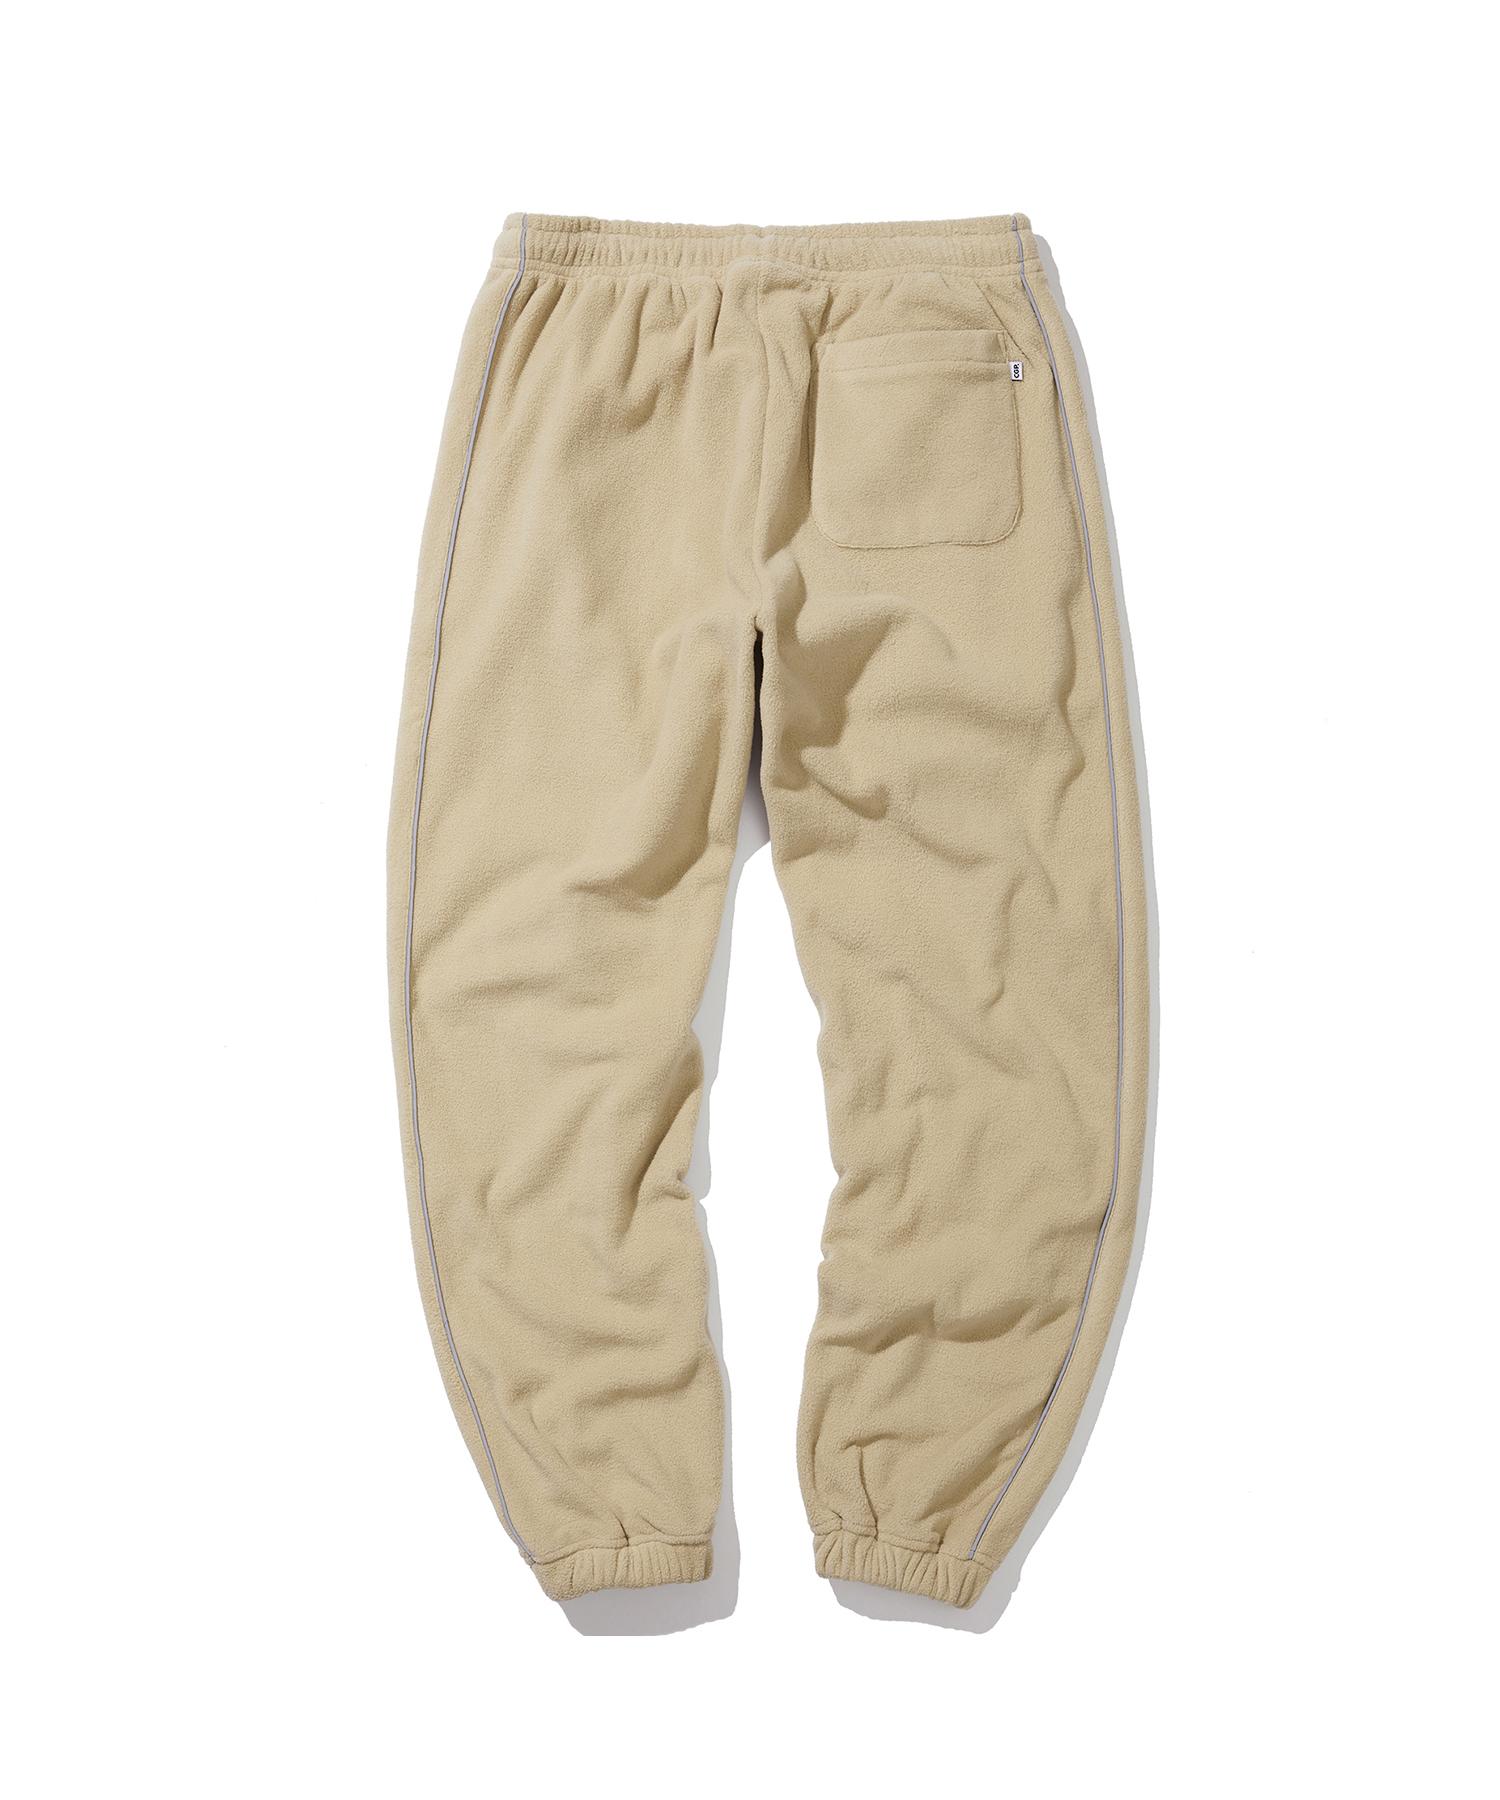 PIPING FLEECE JOGGER PANTS - BE